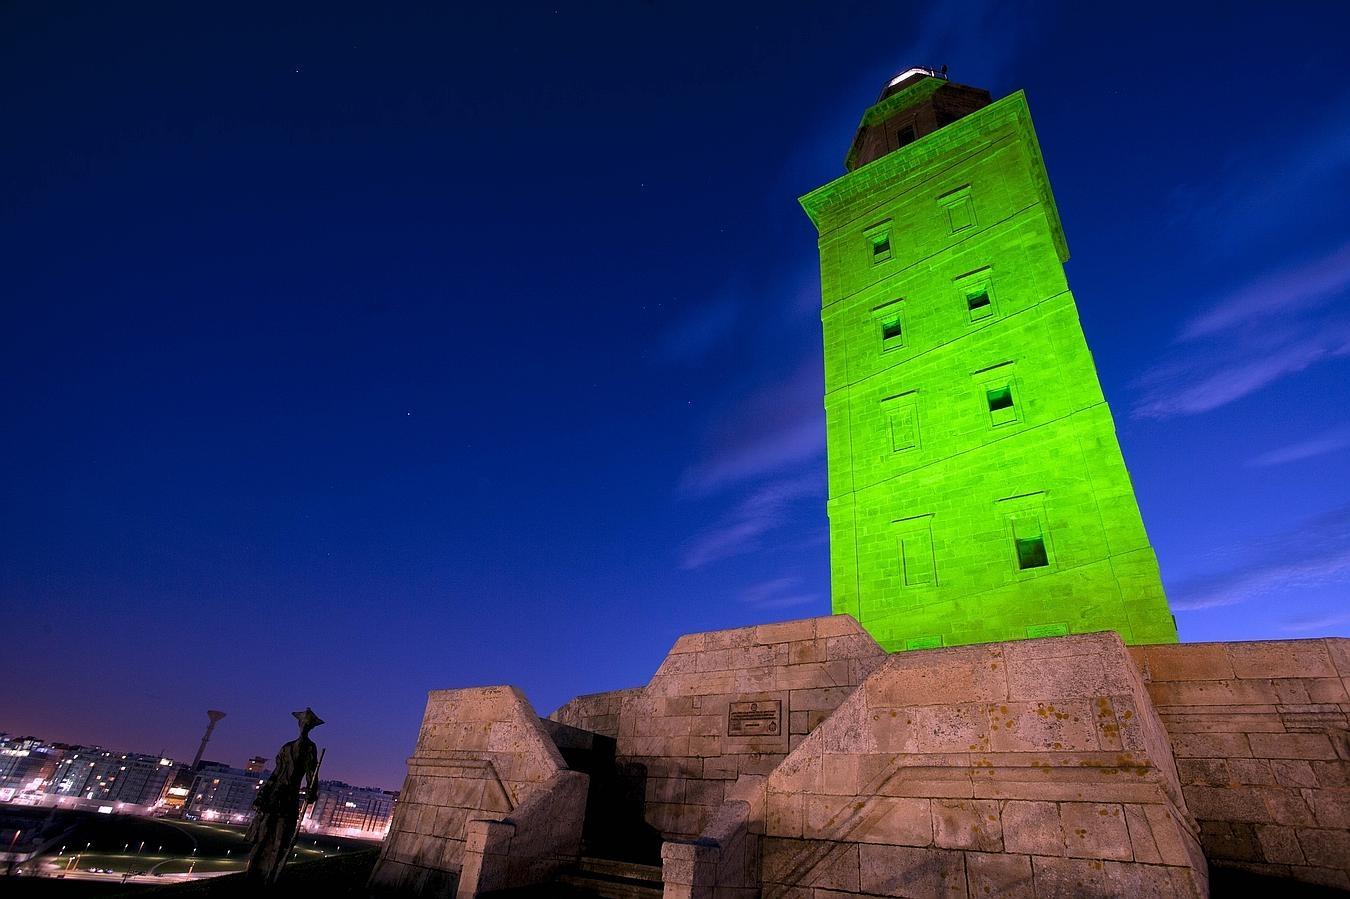 torre-hercules--1350x900